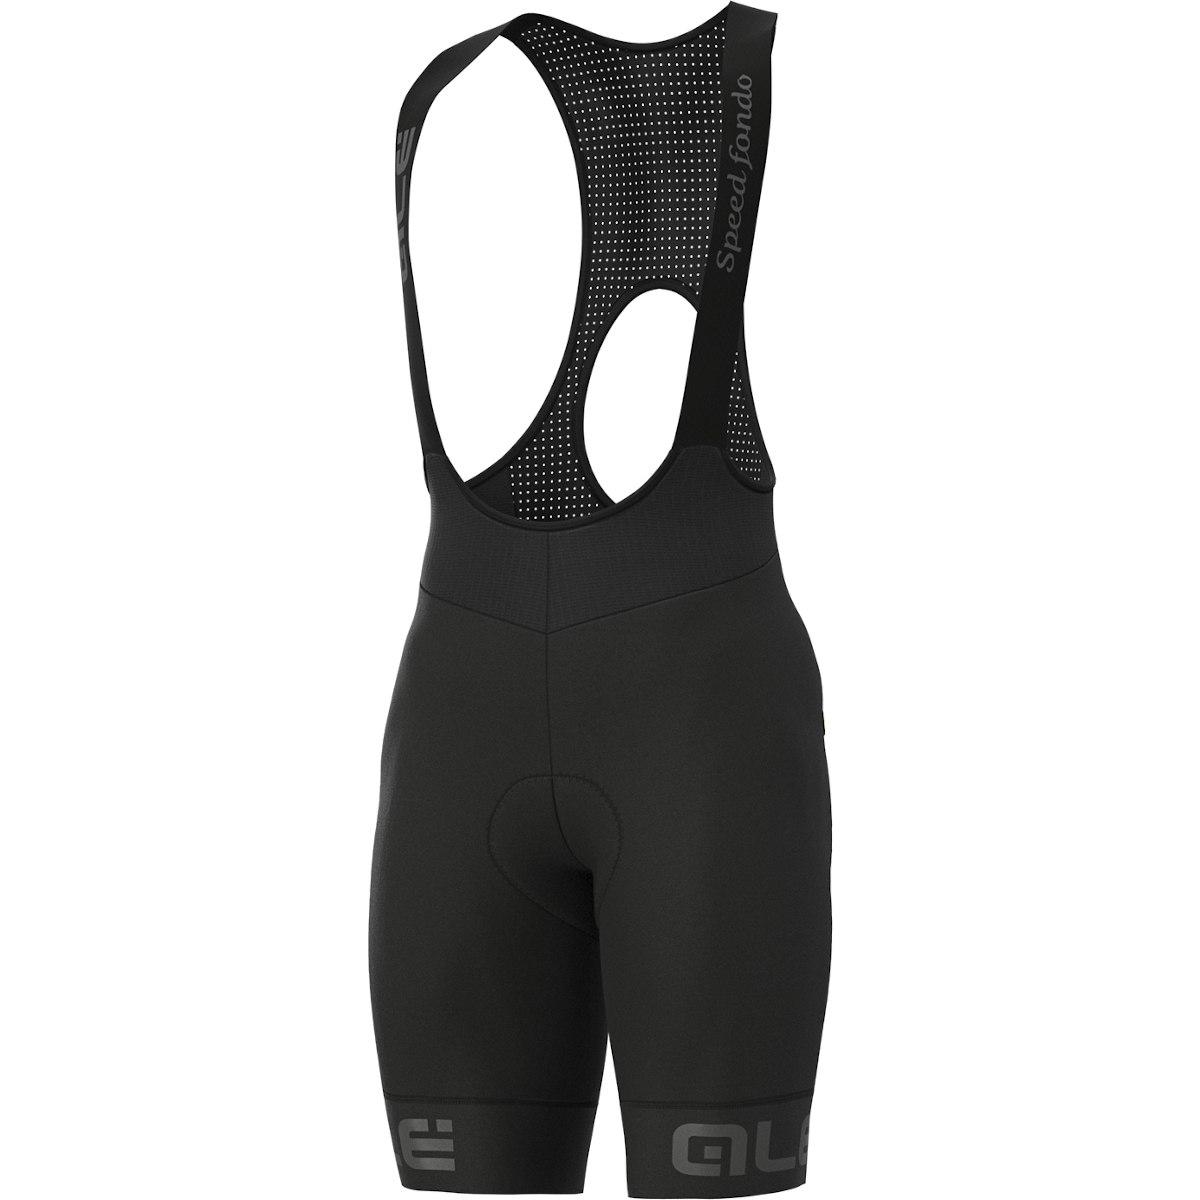 Alé R-EV1 Speedfondo Bib Shorts - black/grey